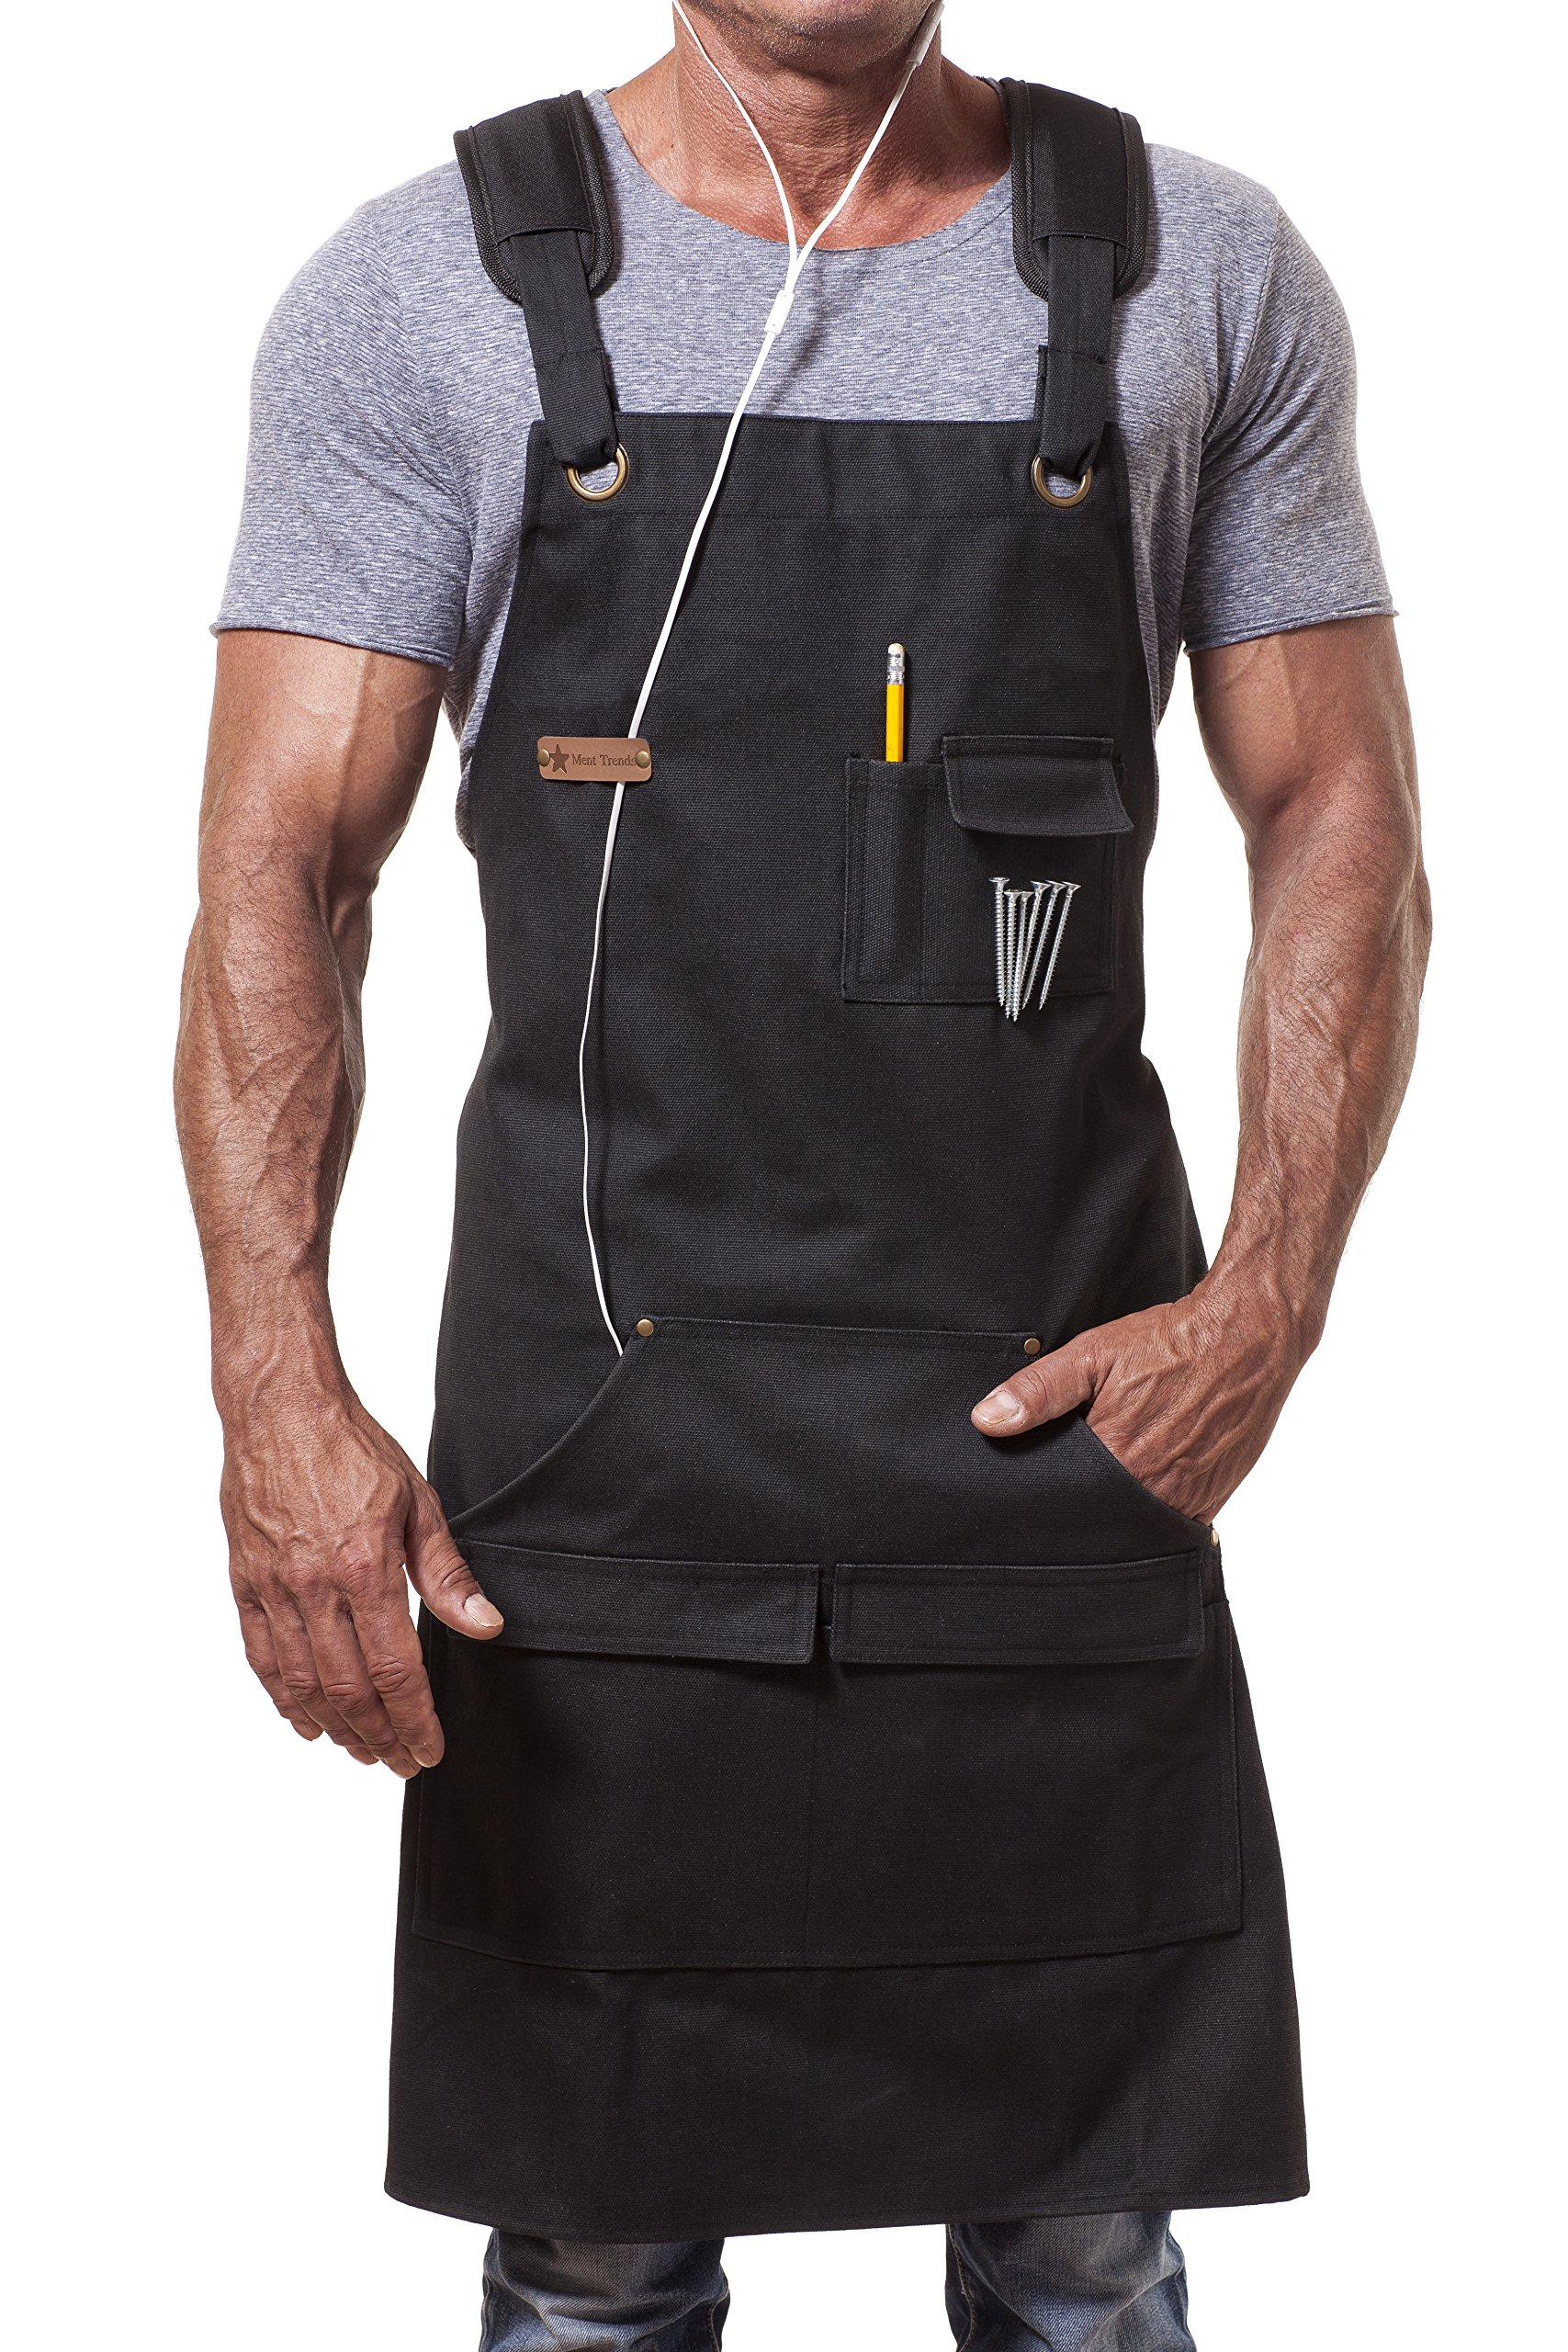 Apron For Men Women Heavy Duty Waxed Canvas Black Waterproof Shop Bib Adjustable M to XXL; Magnetic Pocket + Quick Release Buckle + Dual Tool Loops + Headphones Loop + Padded Straps